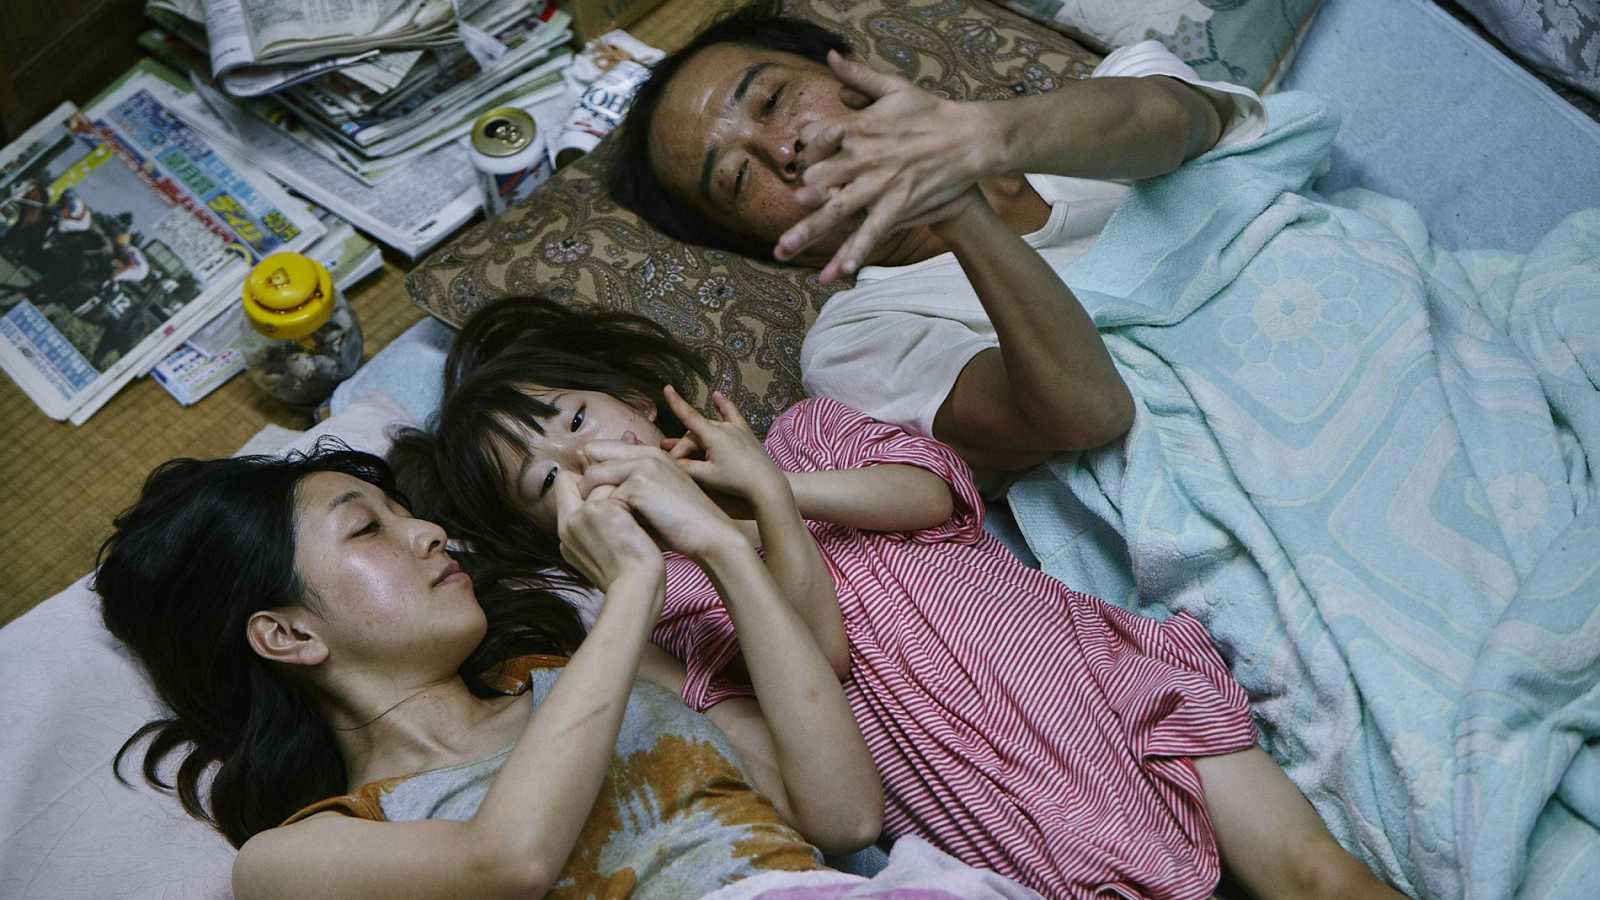 UN ASUNTO DE FAMILIA (Shoplifters) - pelicula de Hirokazu Koreeda